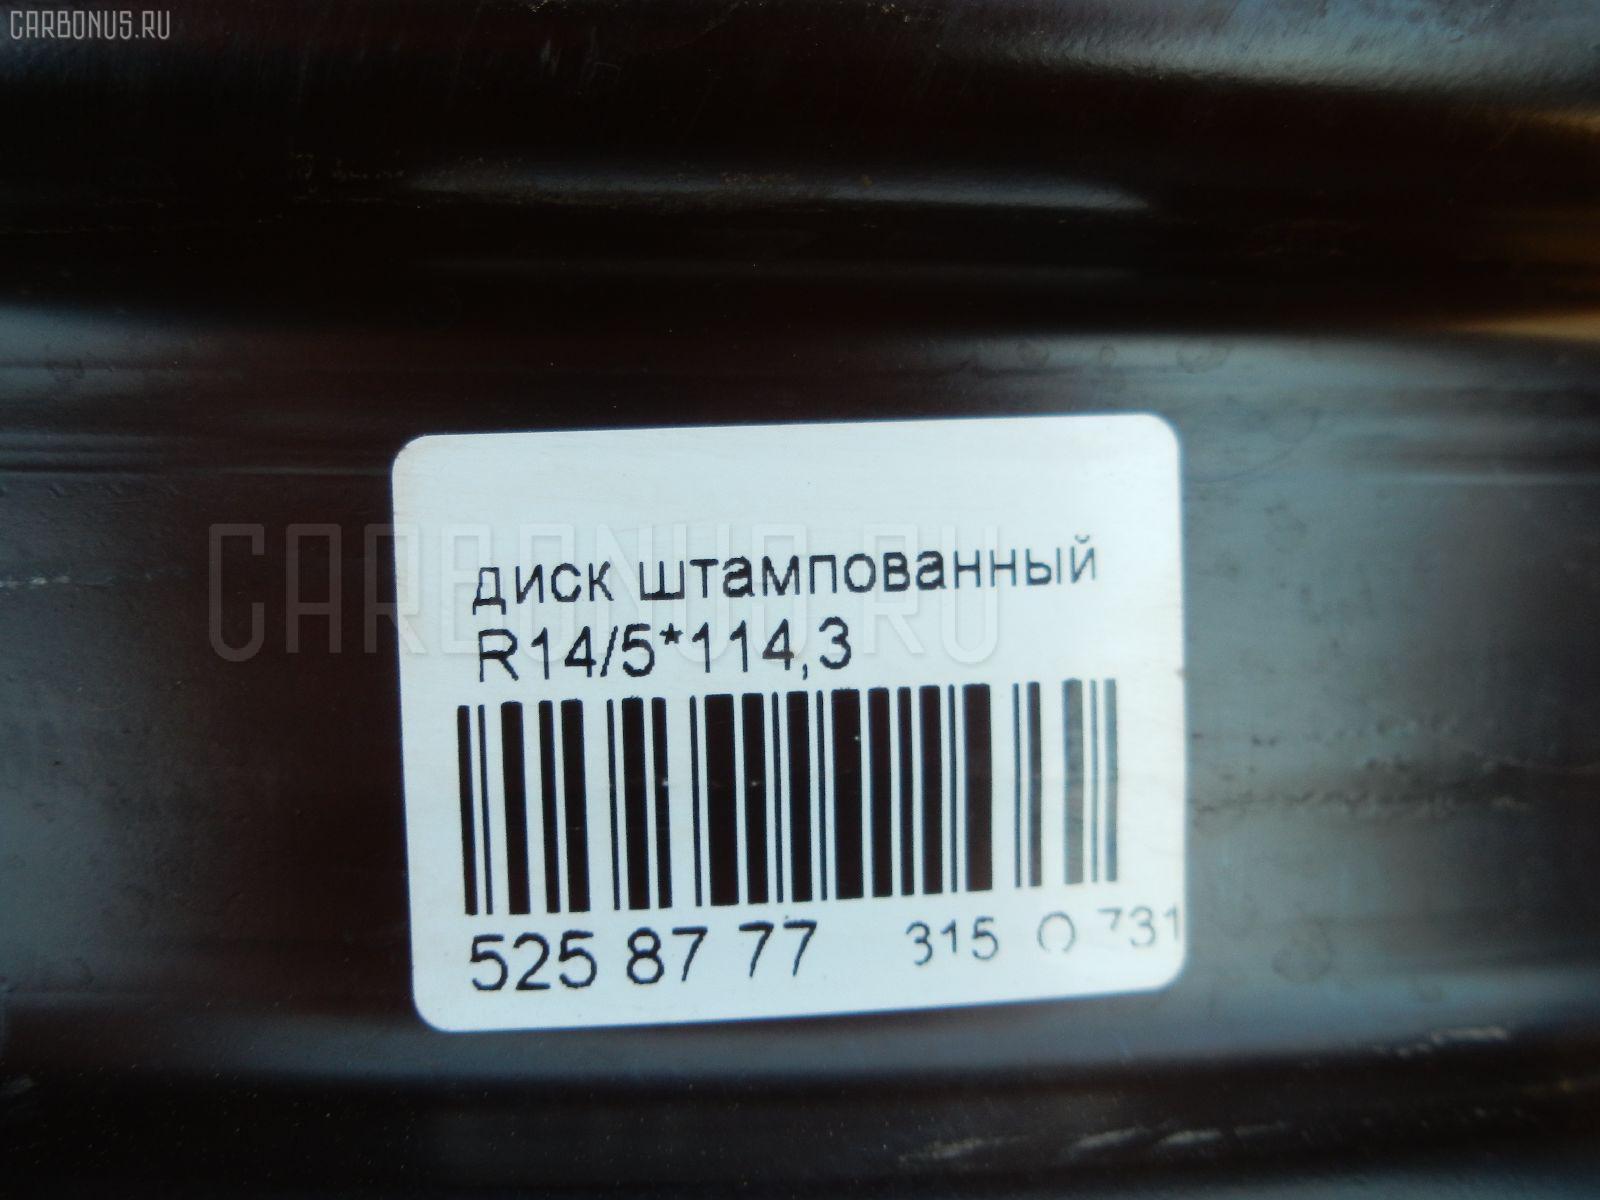 Диск штампованный R14 / 5-114.3 / C67.1 / 5.5JJ Фото 2